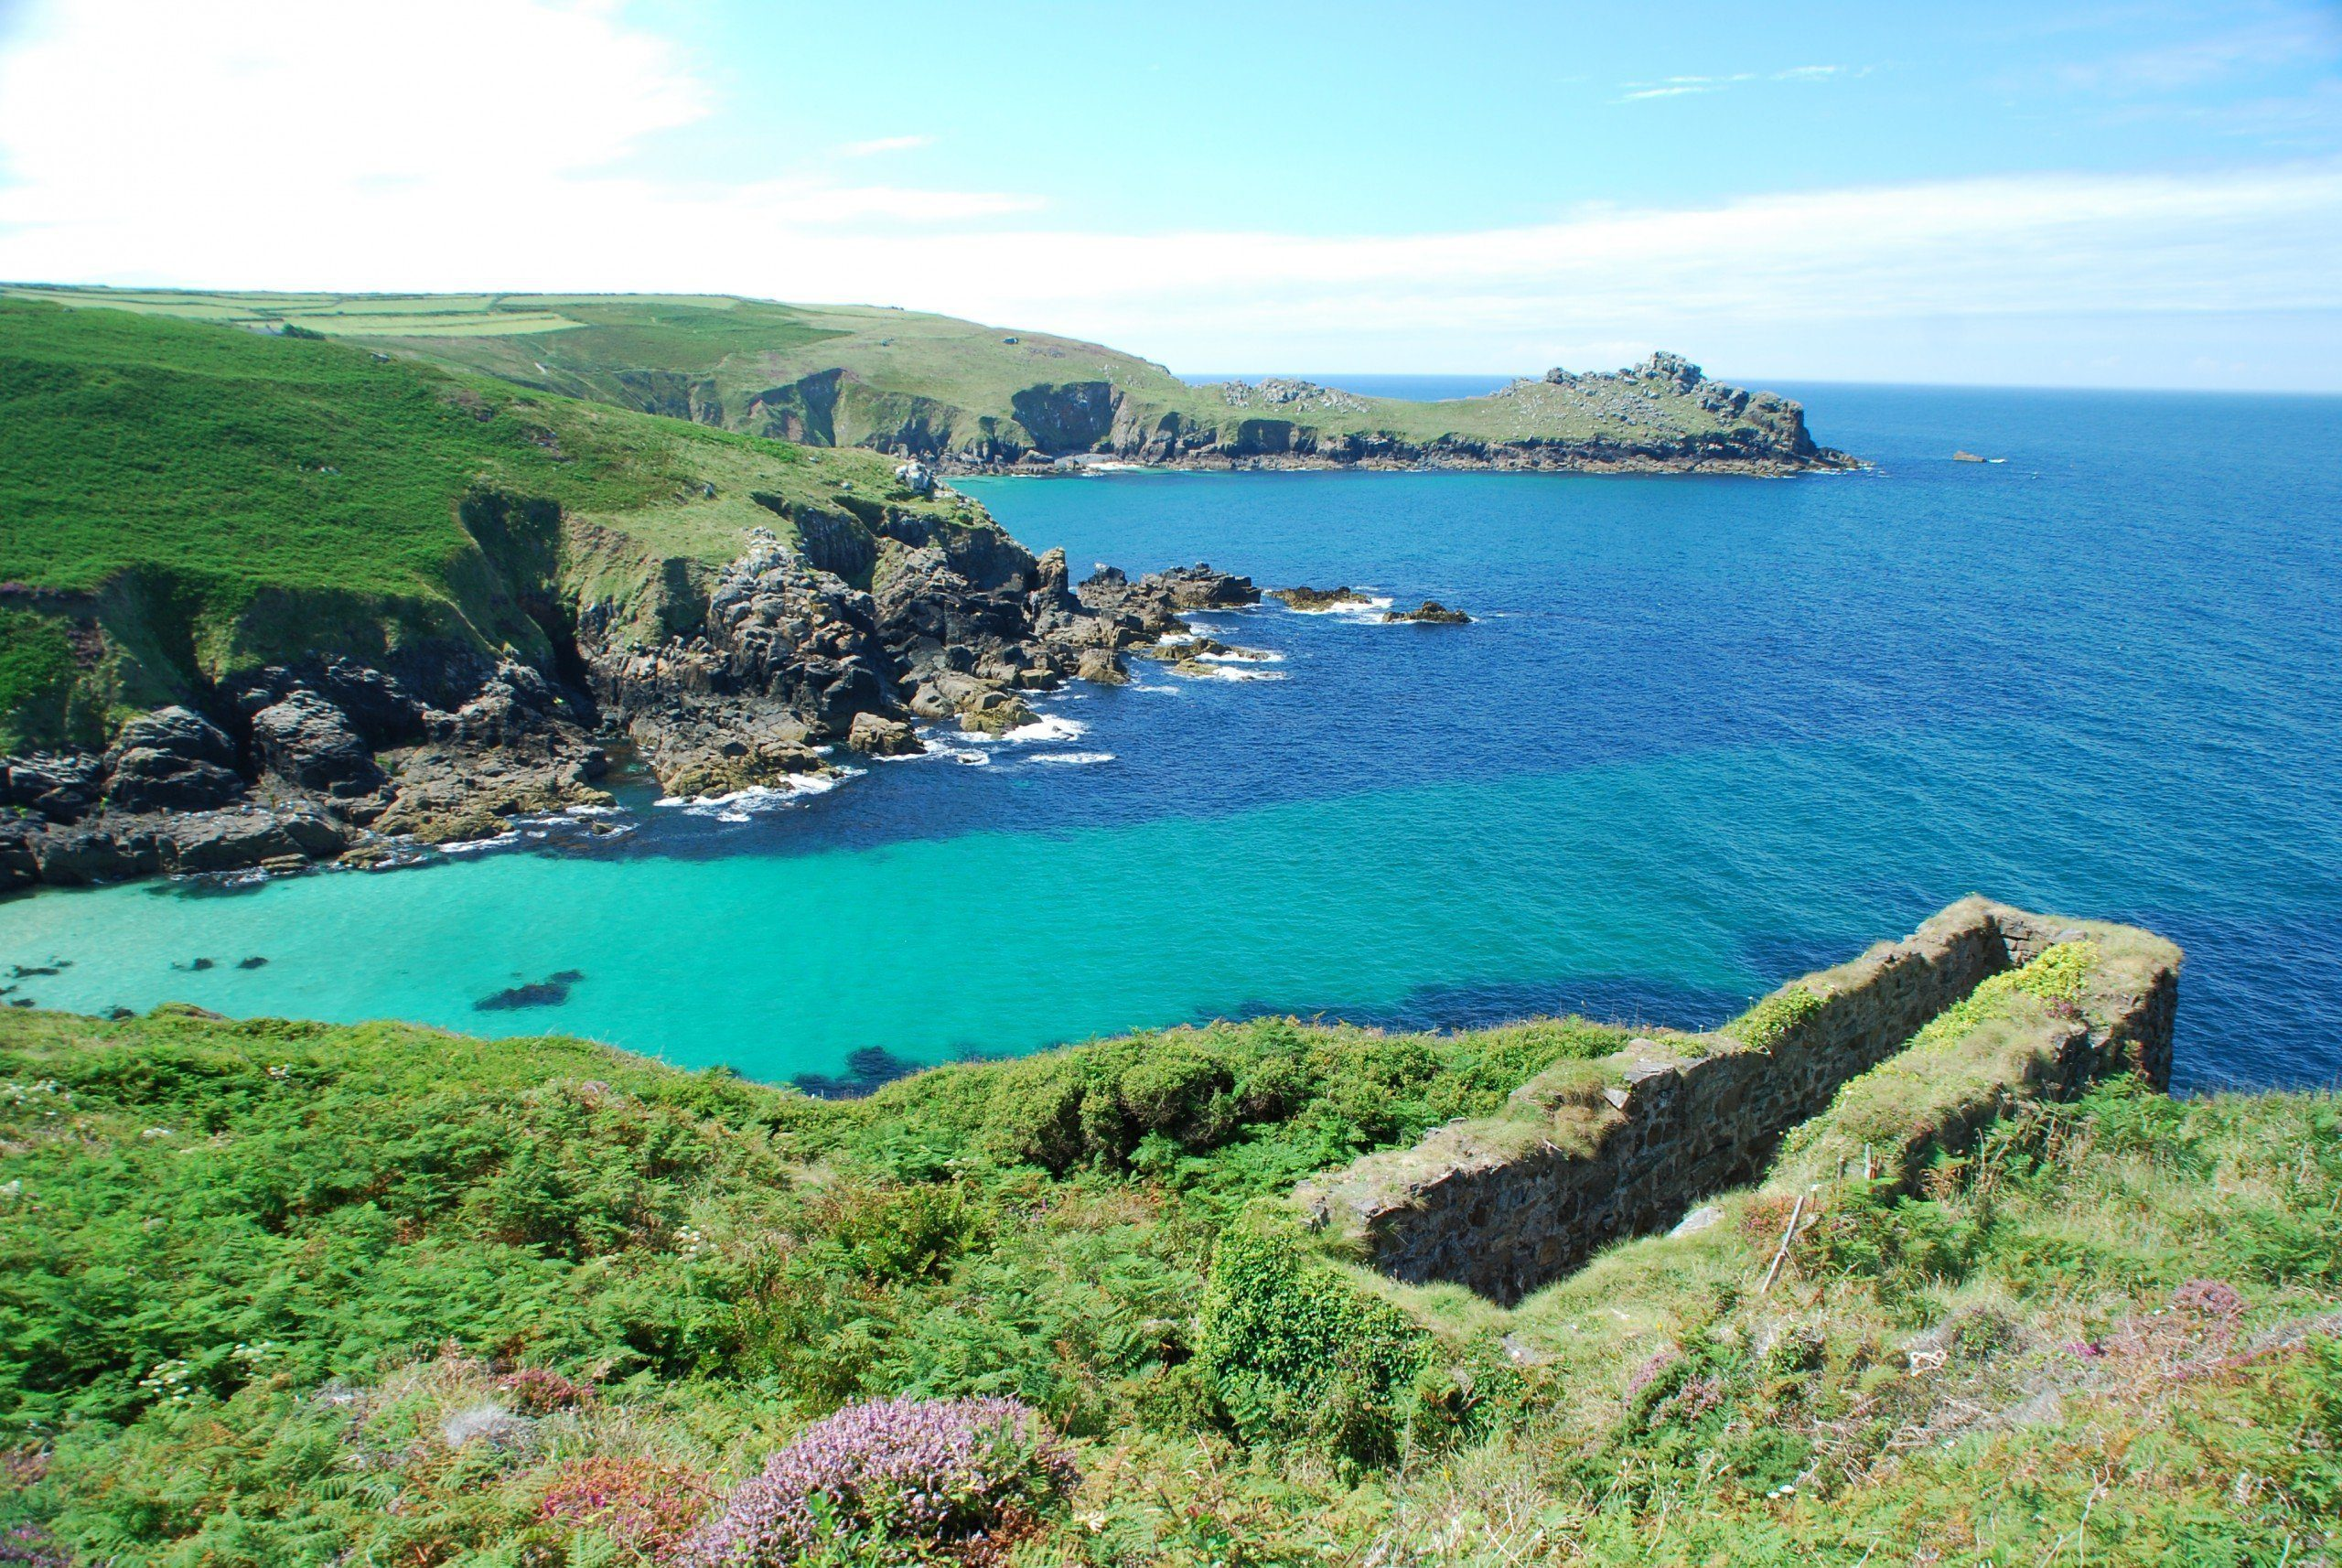 Beautiful aquamarine seas on the way to Land's End